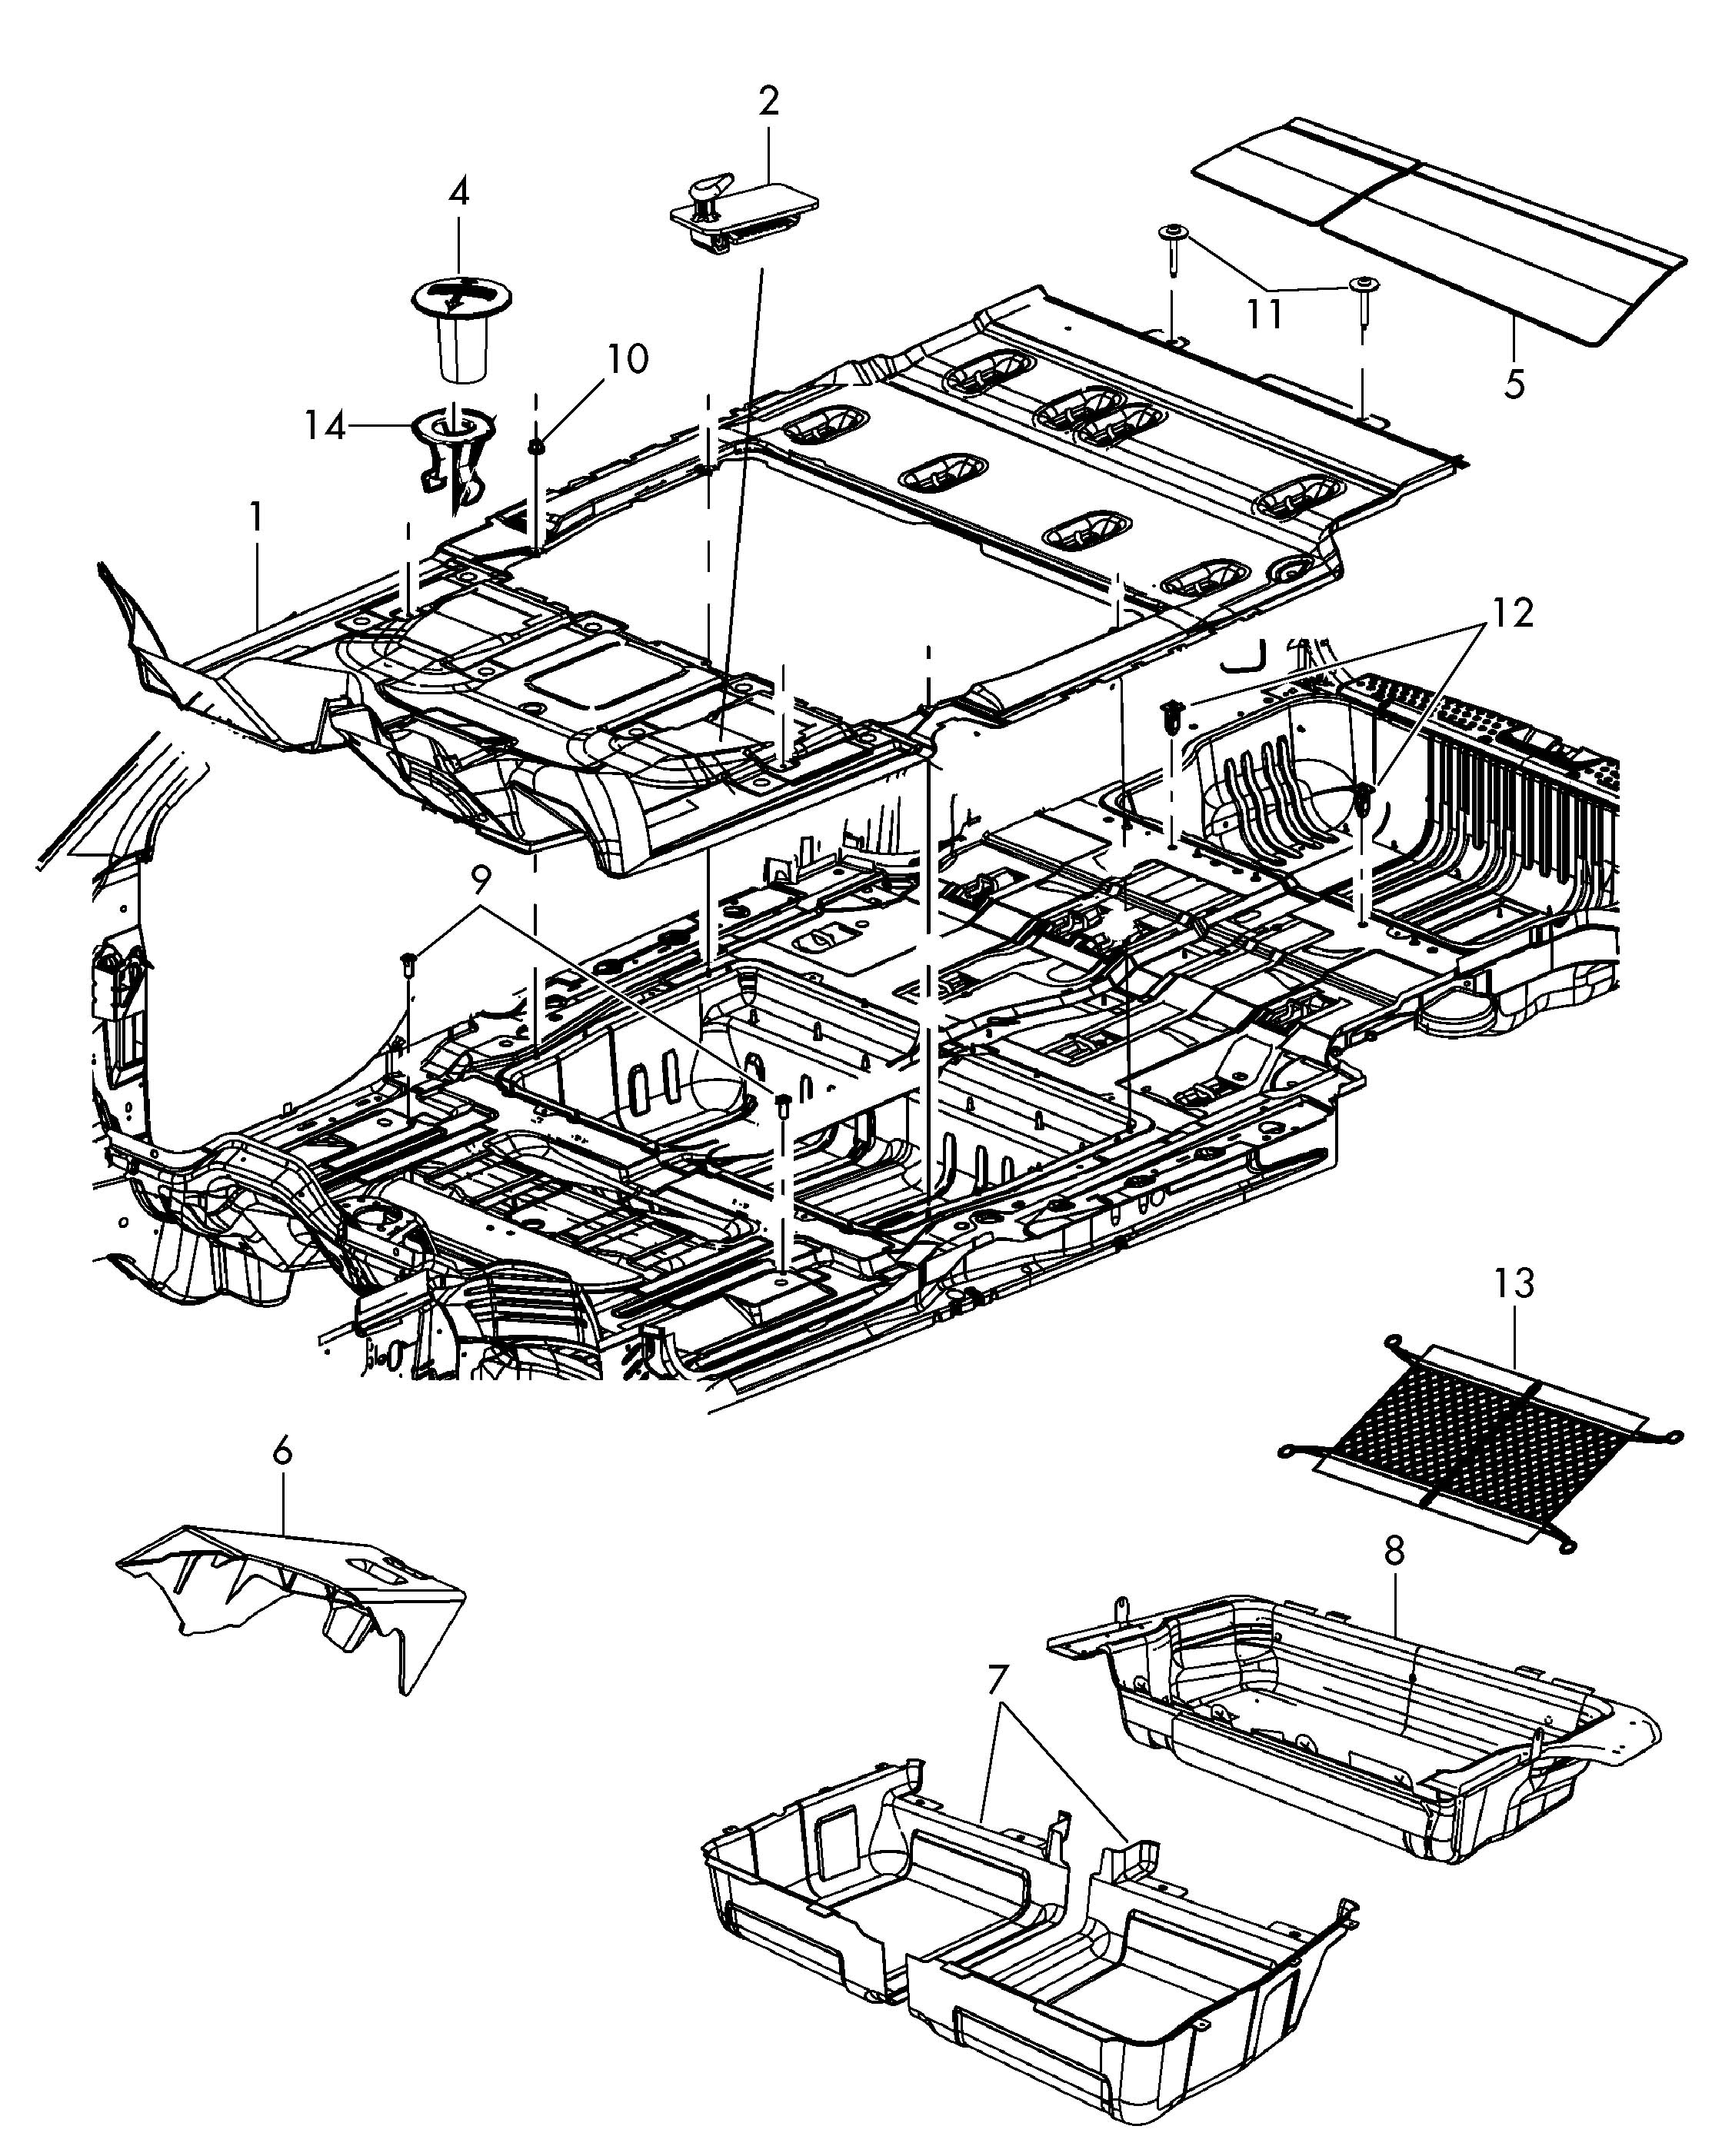 Volkswagen Routan Retaining clip guide for spare tire